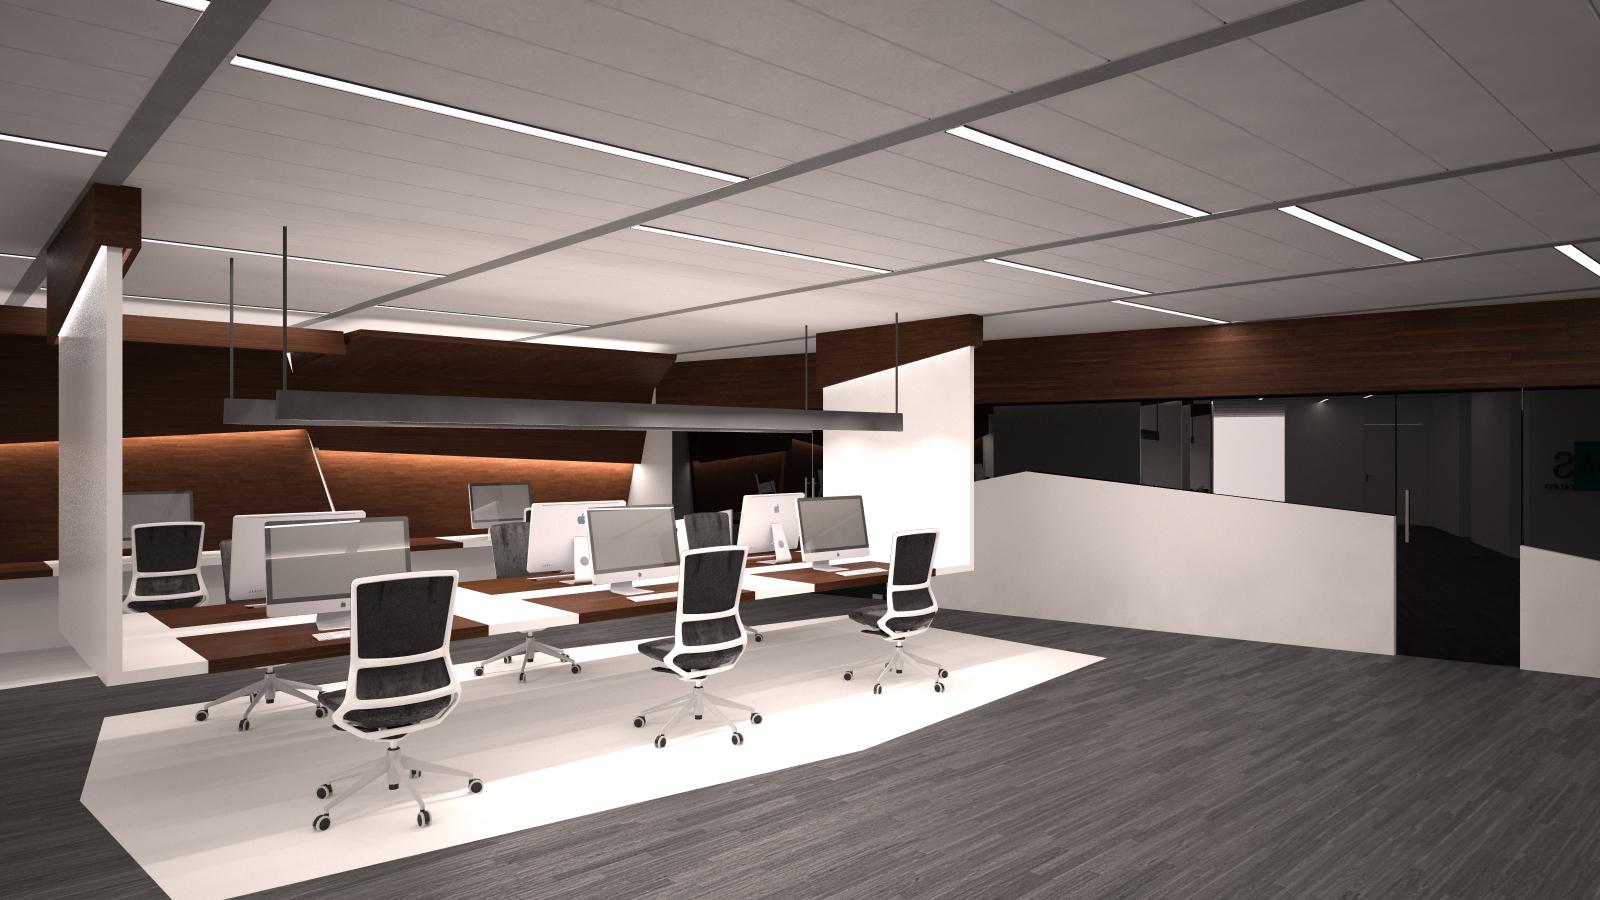 Dise o de oficinas en madrid grupoias for Diseno de oficinas pdf